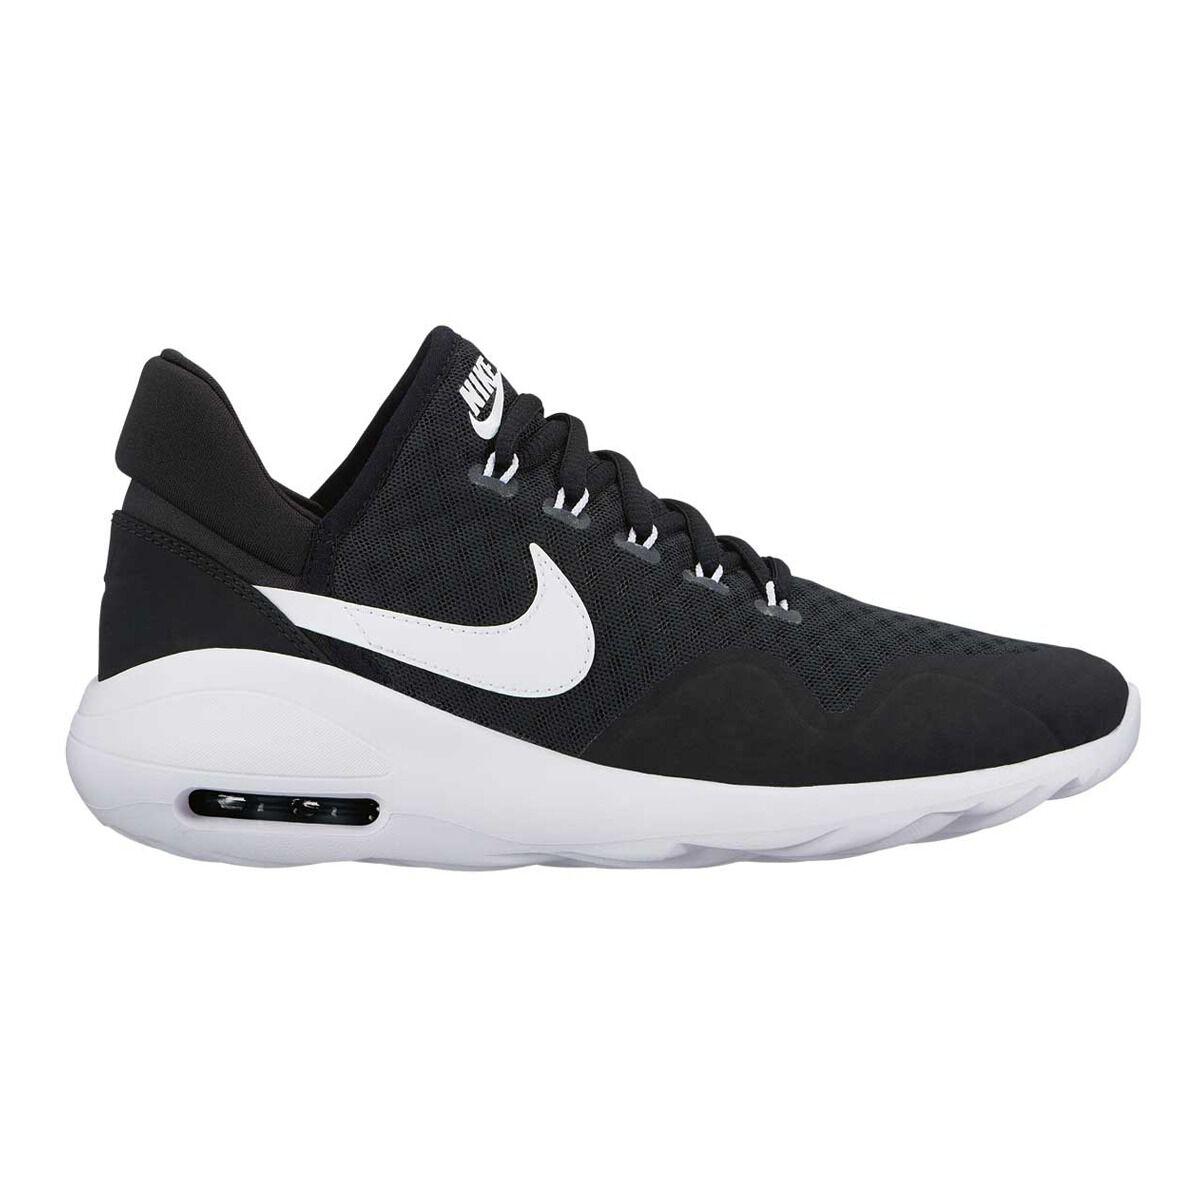 Nike Air Max Sasha Prem AA0550 500 Compare prices on